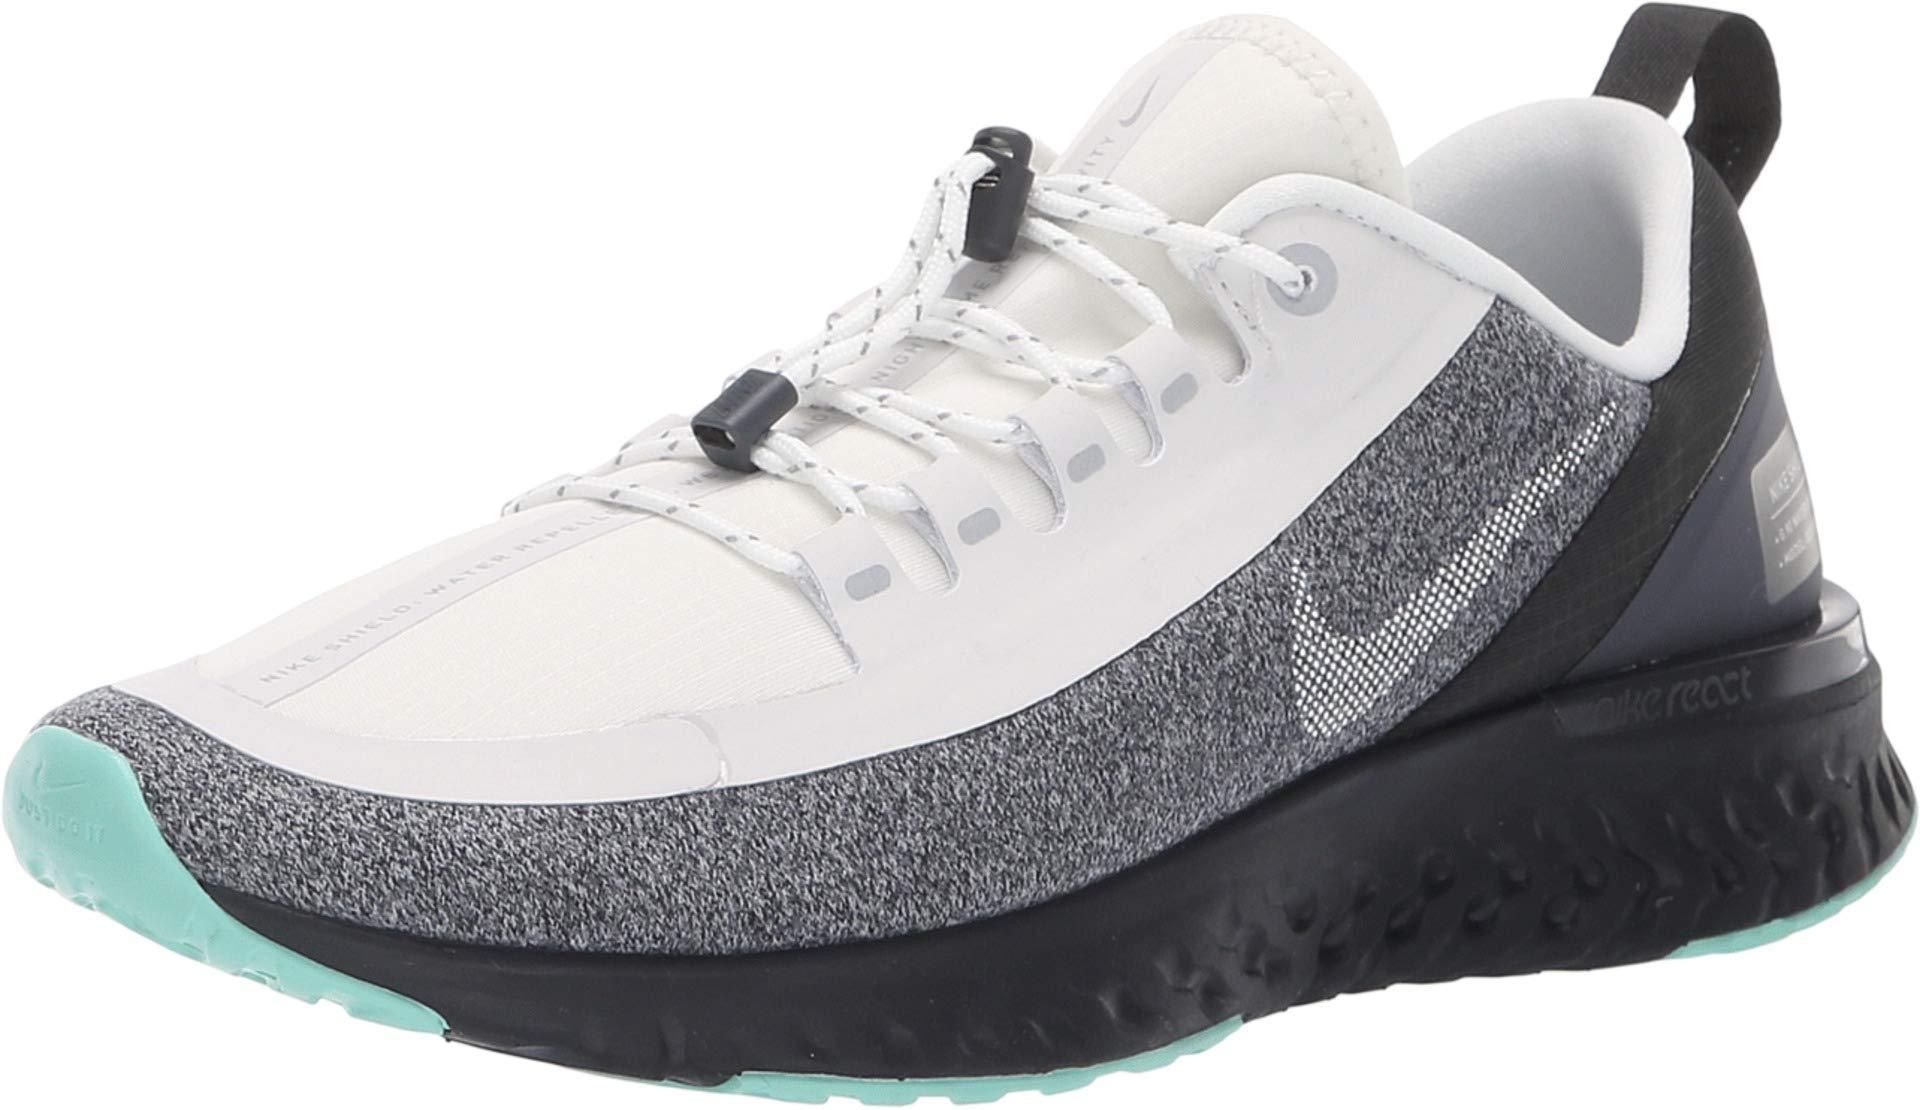 on sale 7dec6 ceeed Nike Women Odyssey React Shield Running Shoe White/Black/Green (US 9.5)